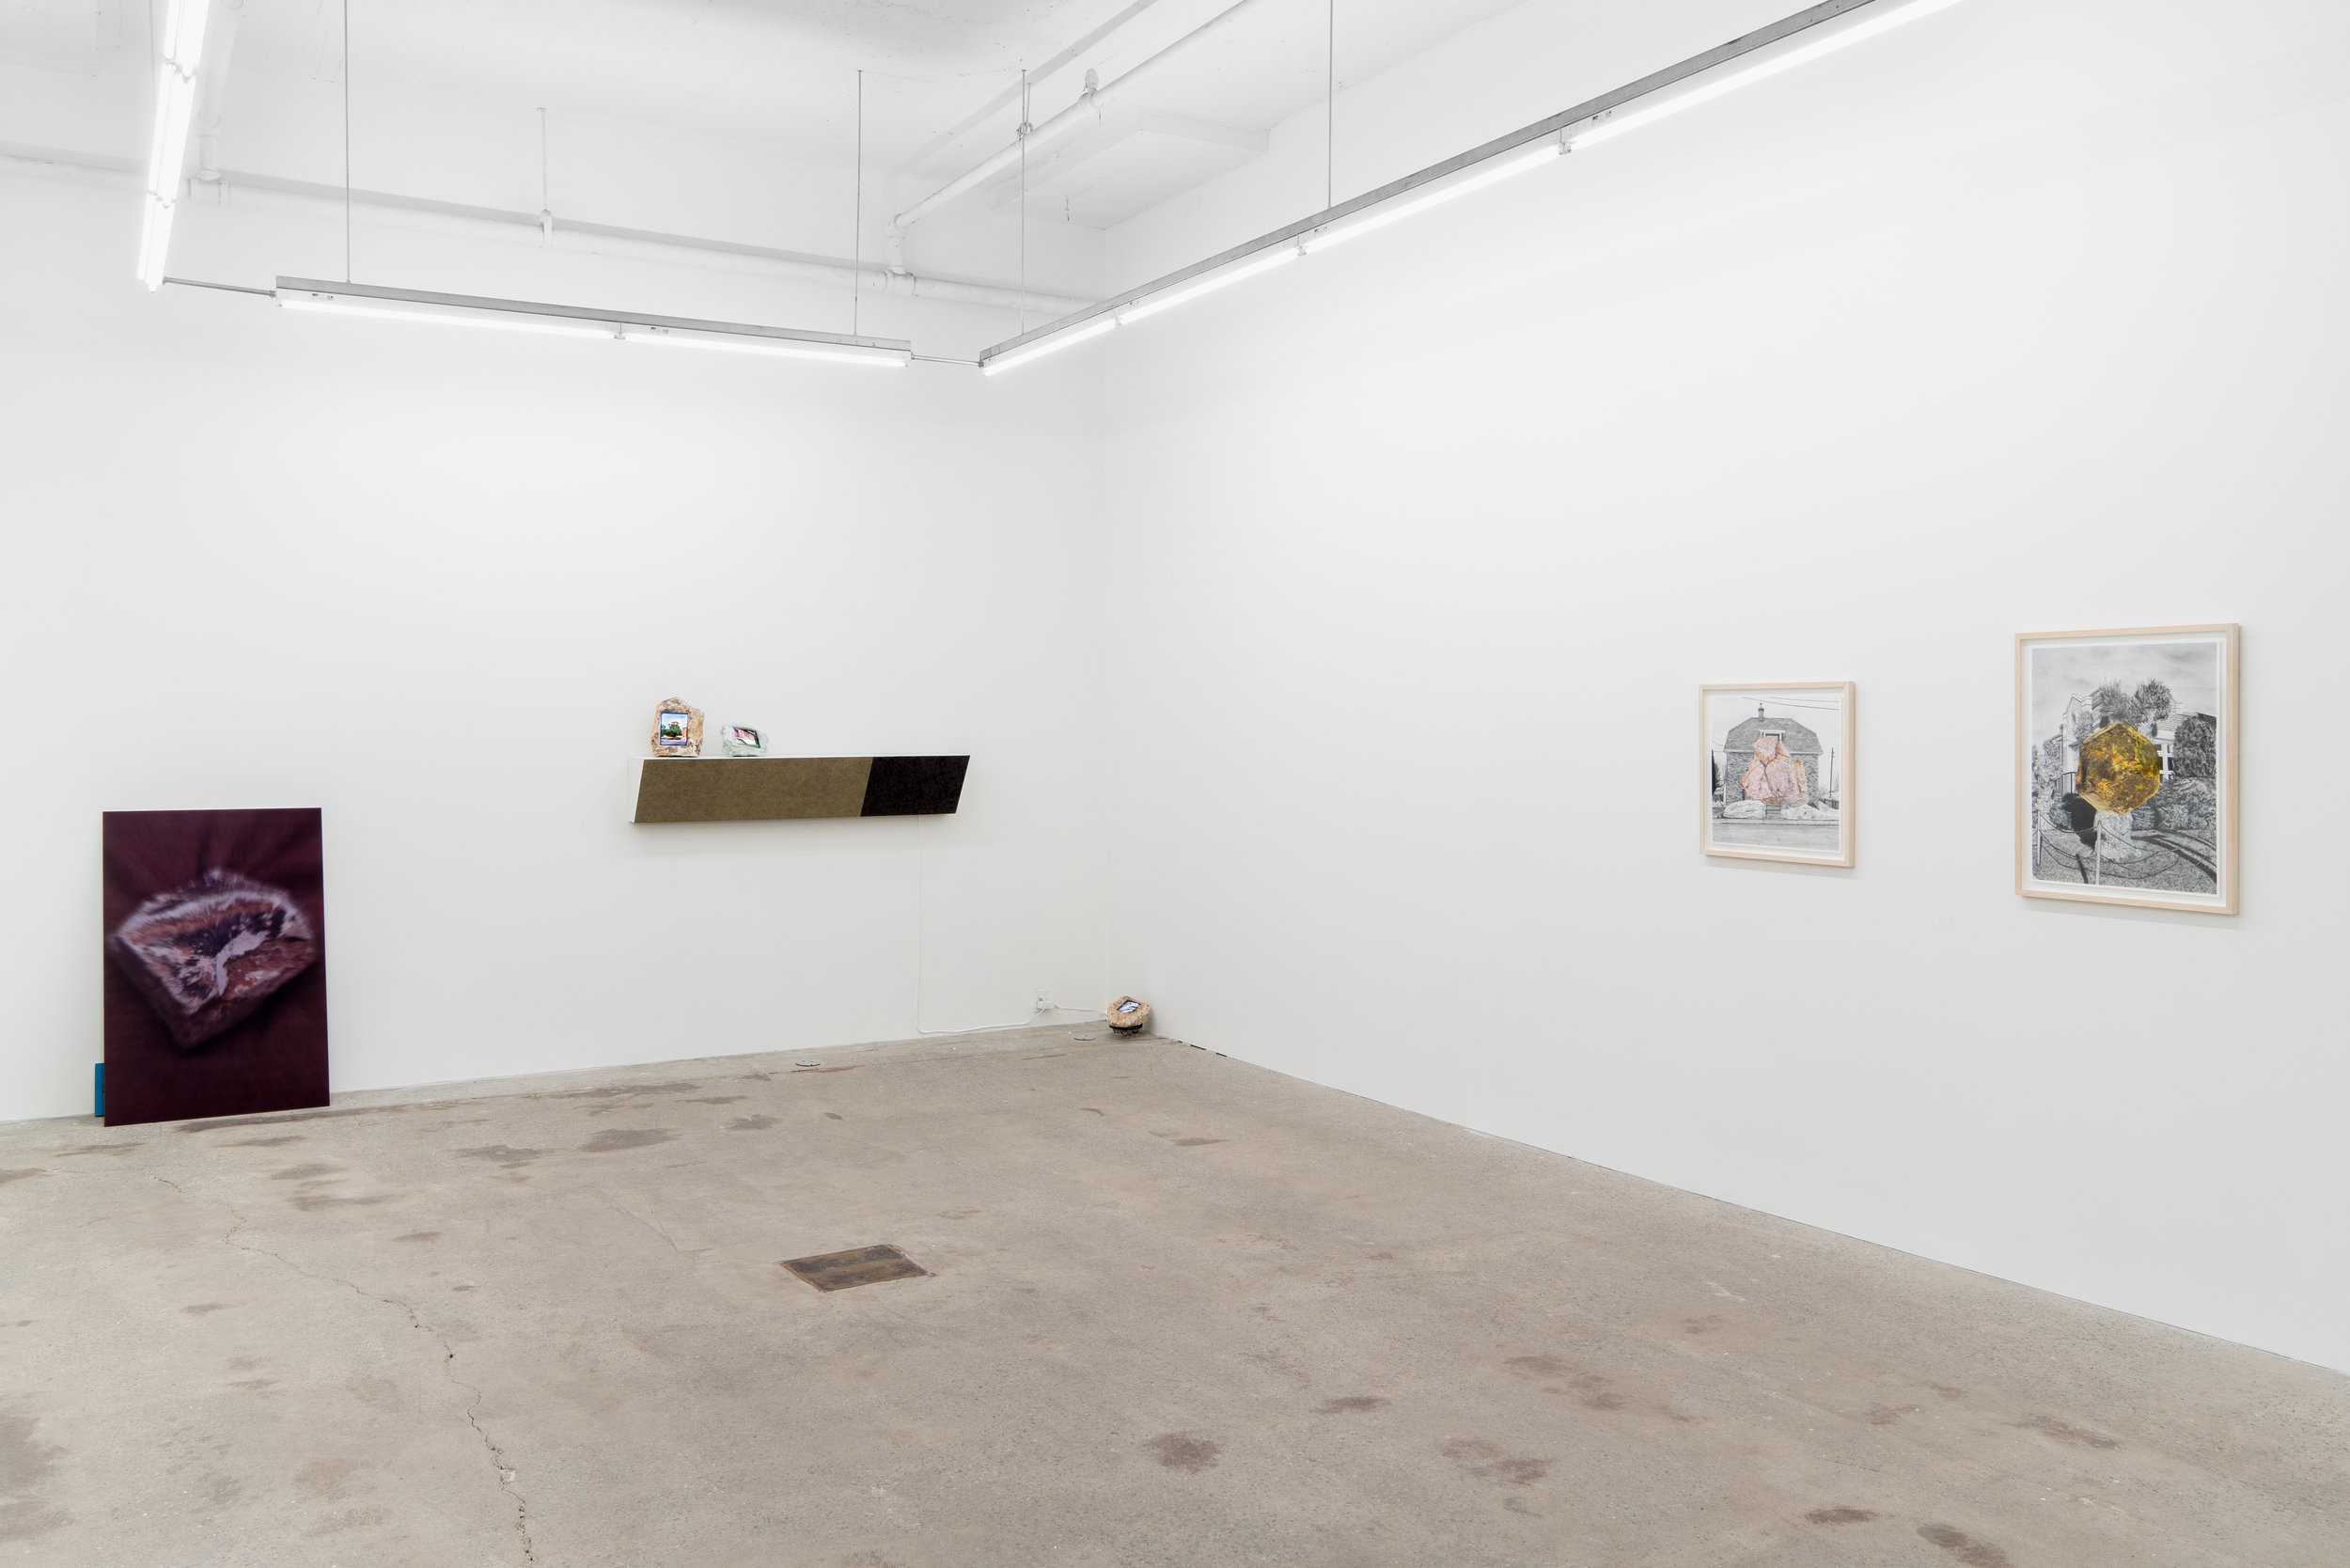 GalerieNicolasRobertNovembre2018 (8 of 27).jpg